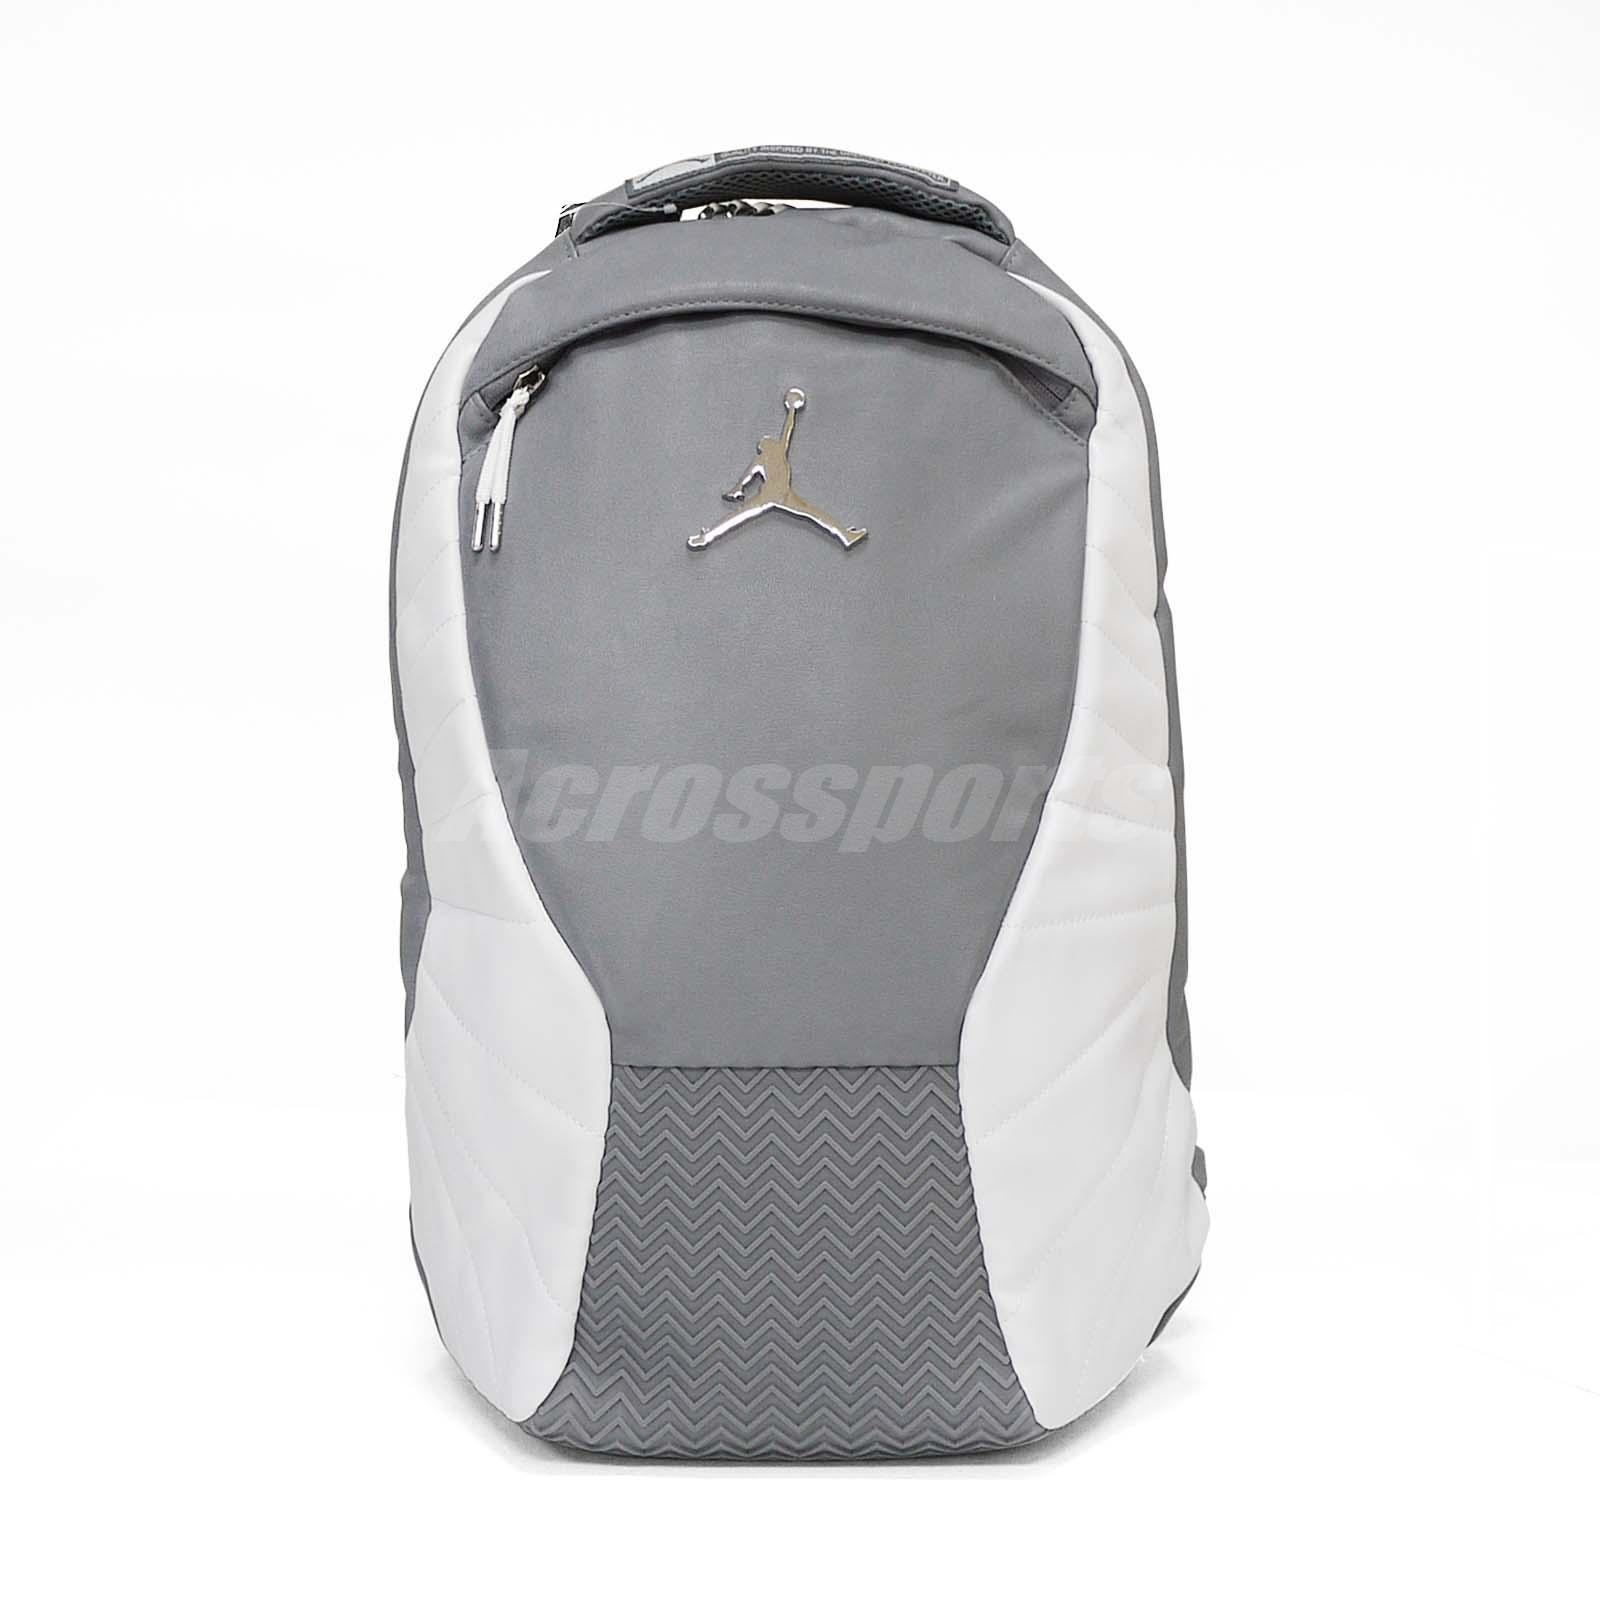 bae2f179130 Nike Air Jordan Retro Backpack- Fenix Toulouse Handball